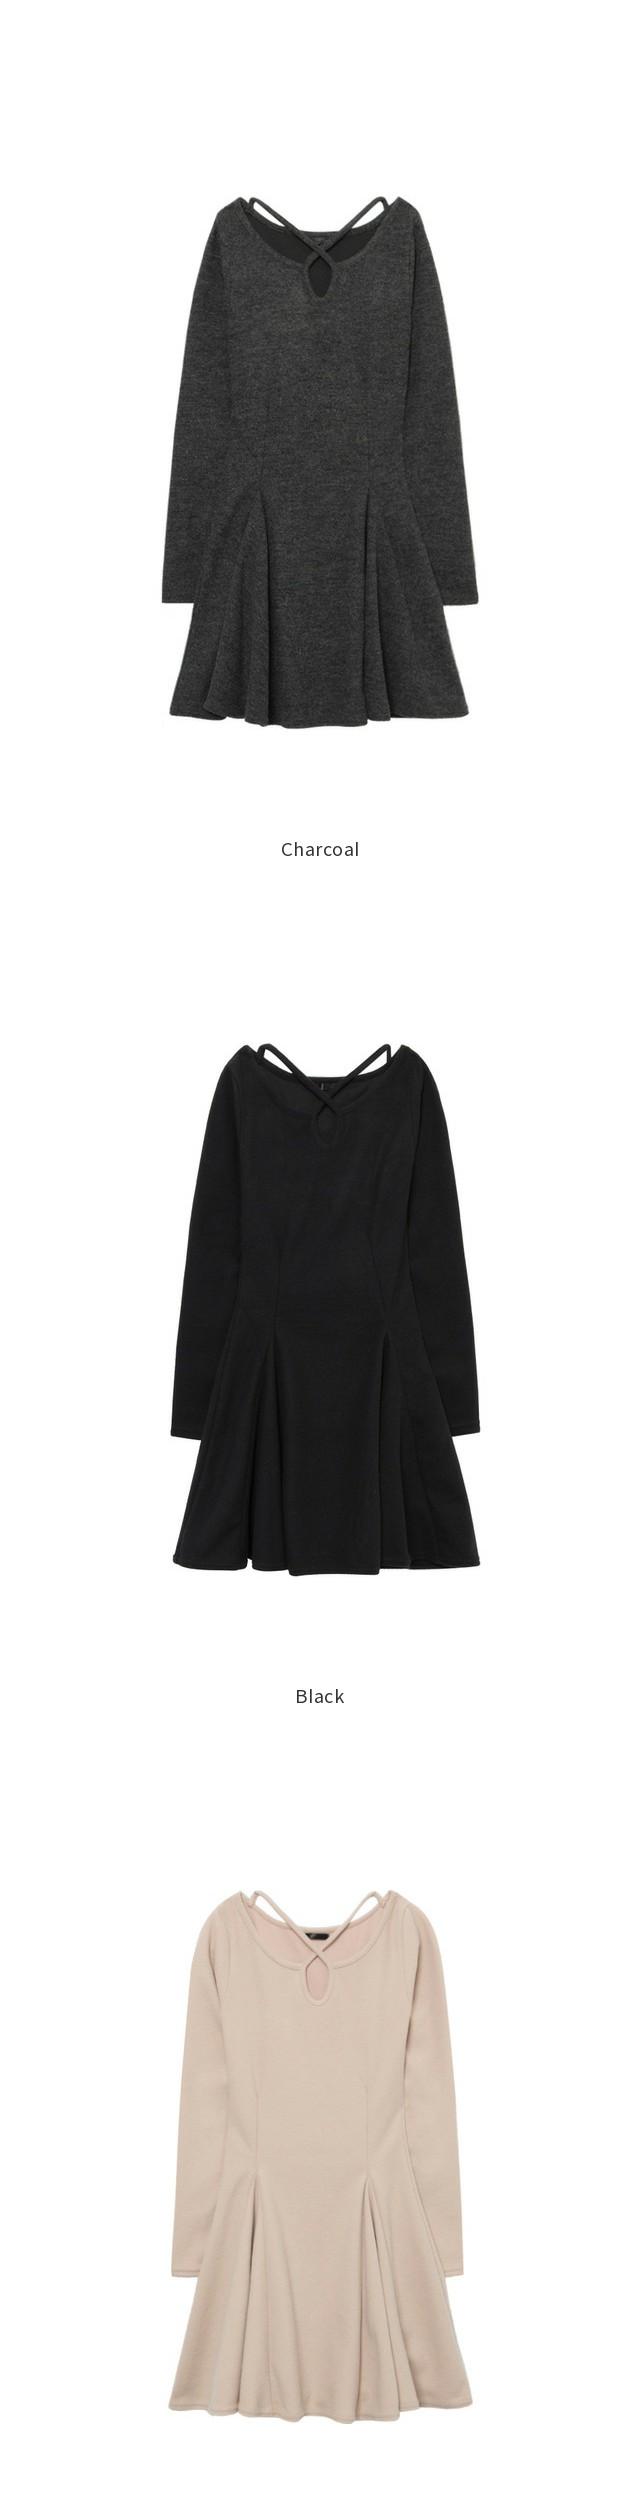 Linda X Brushed Dress